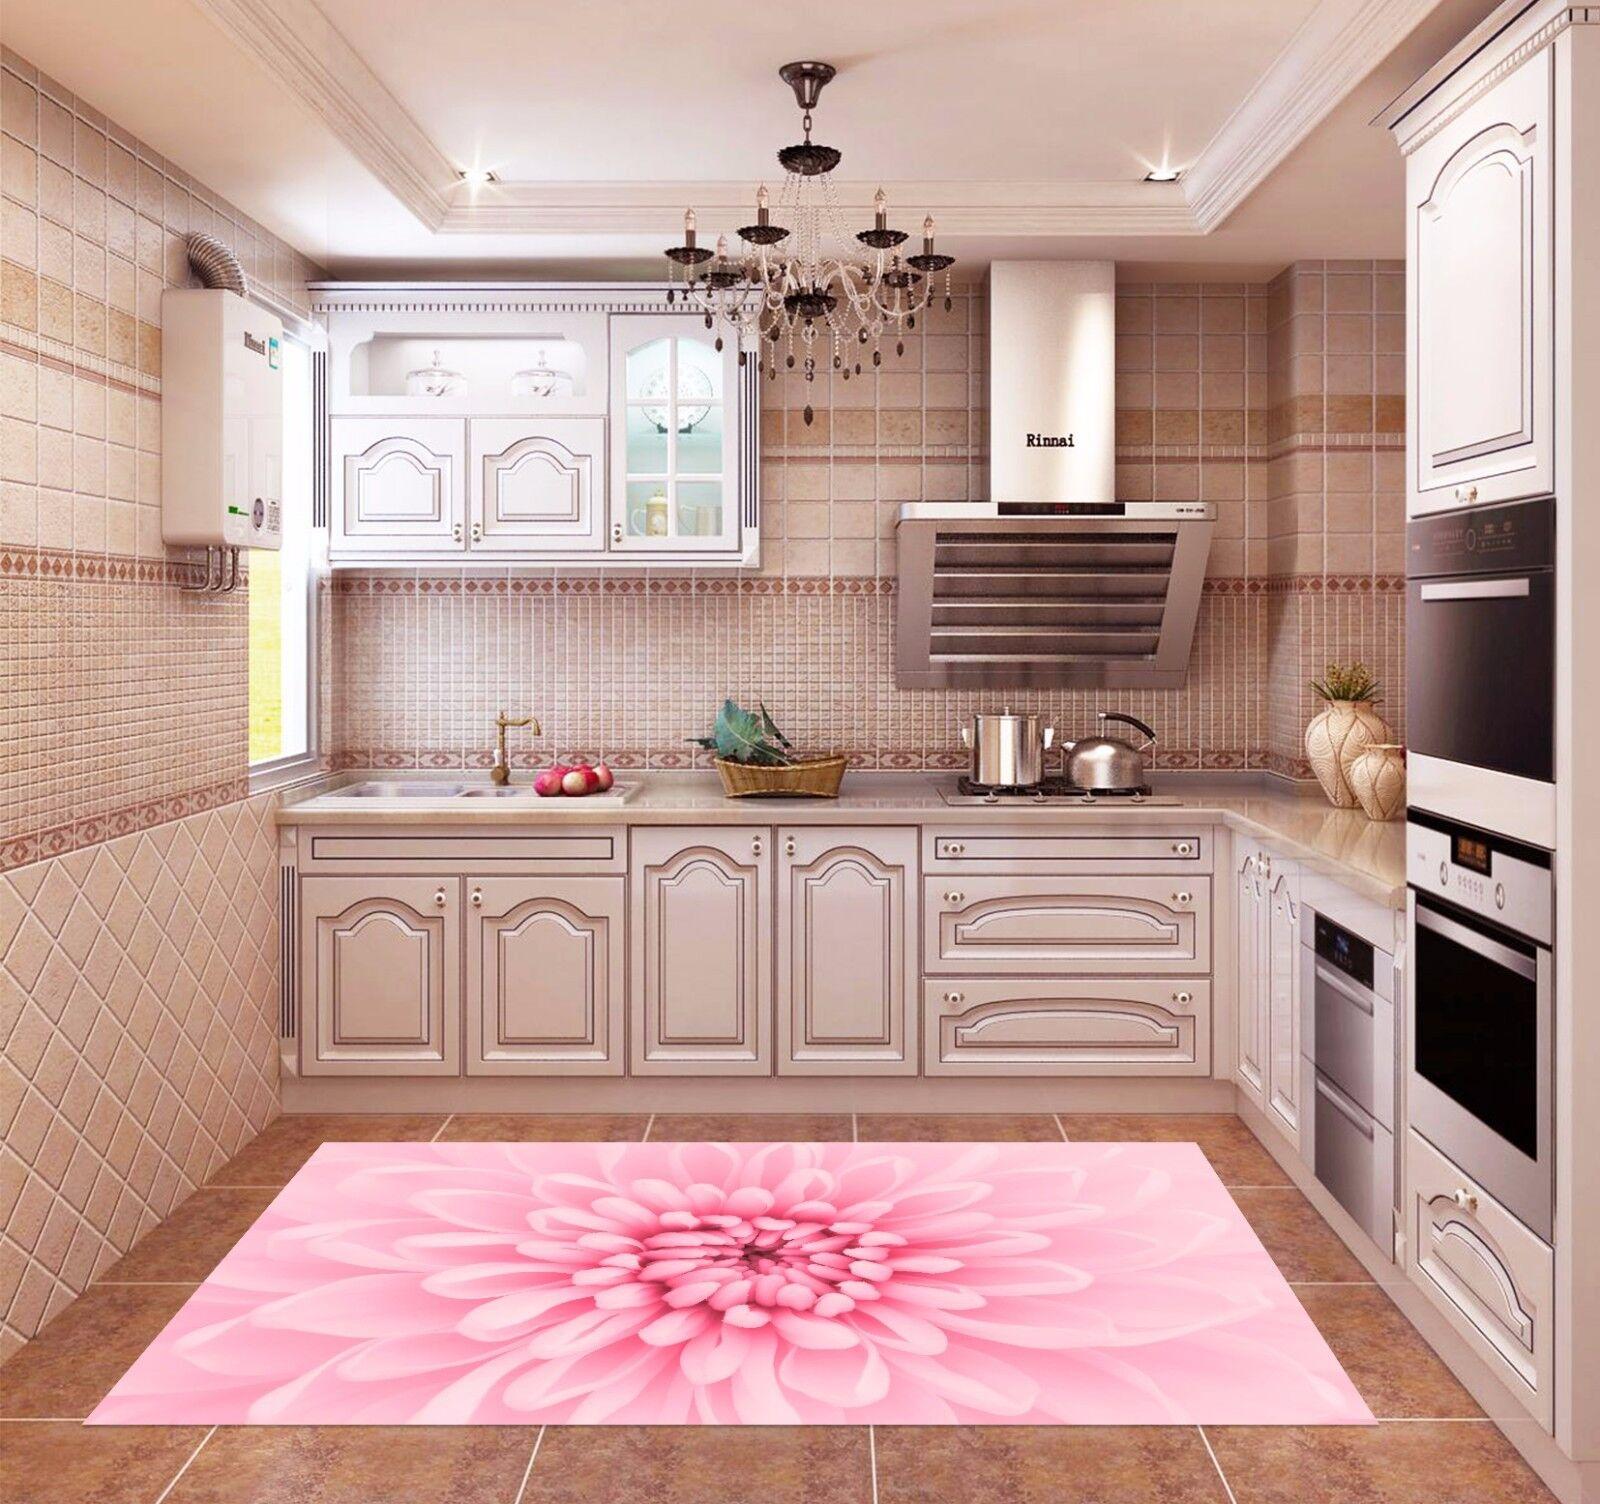 3D Fresh Flower 1 Kitchen Mat Floor Murals Wall Print Wall Deco AJ WALLPAPER AU